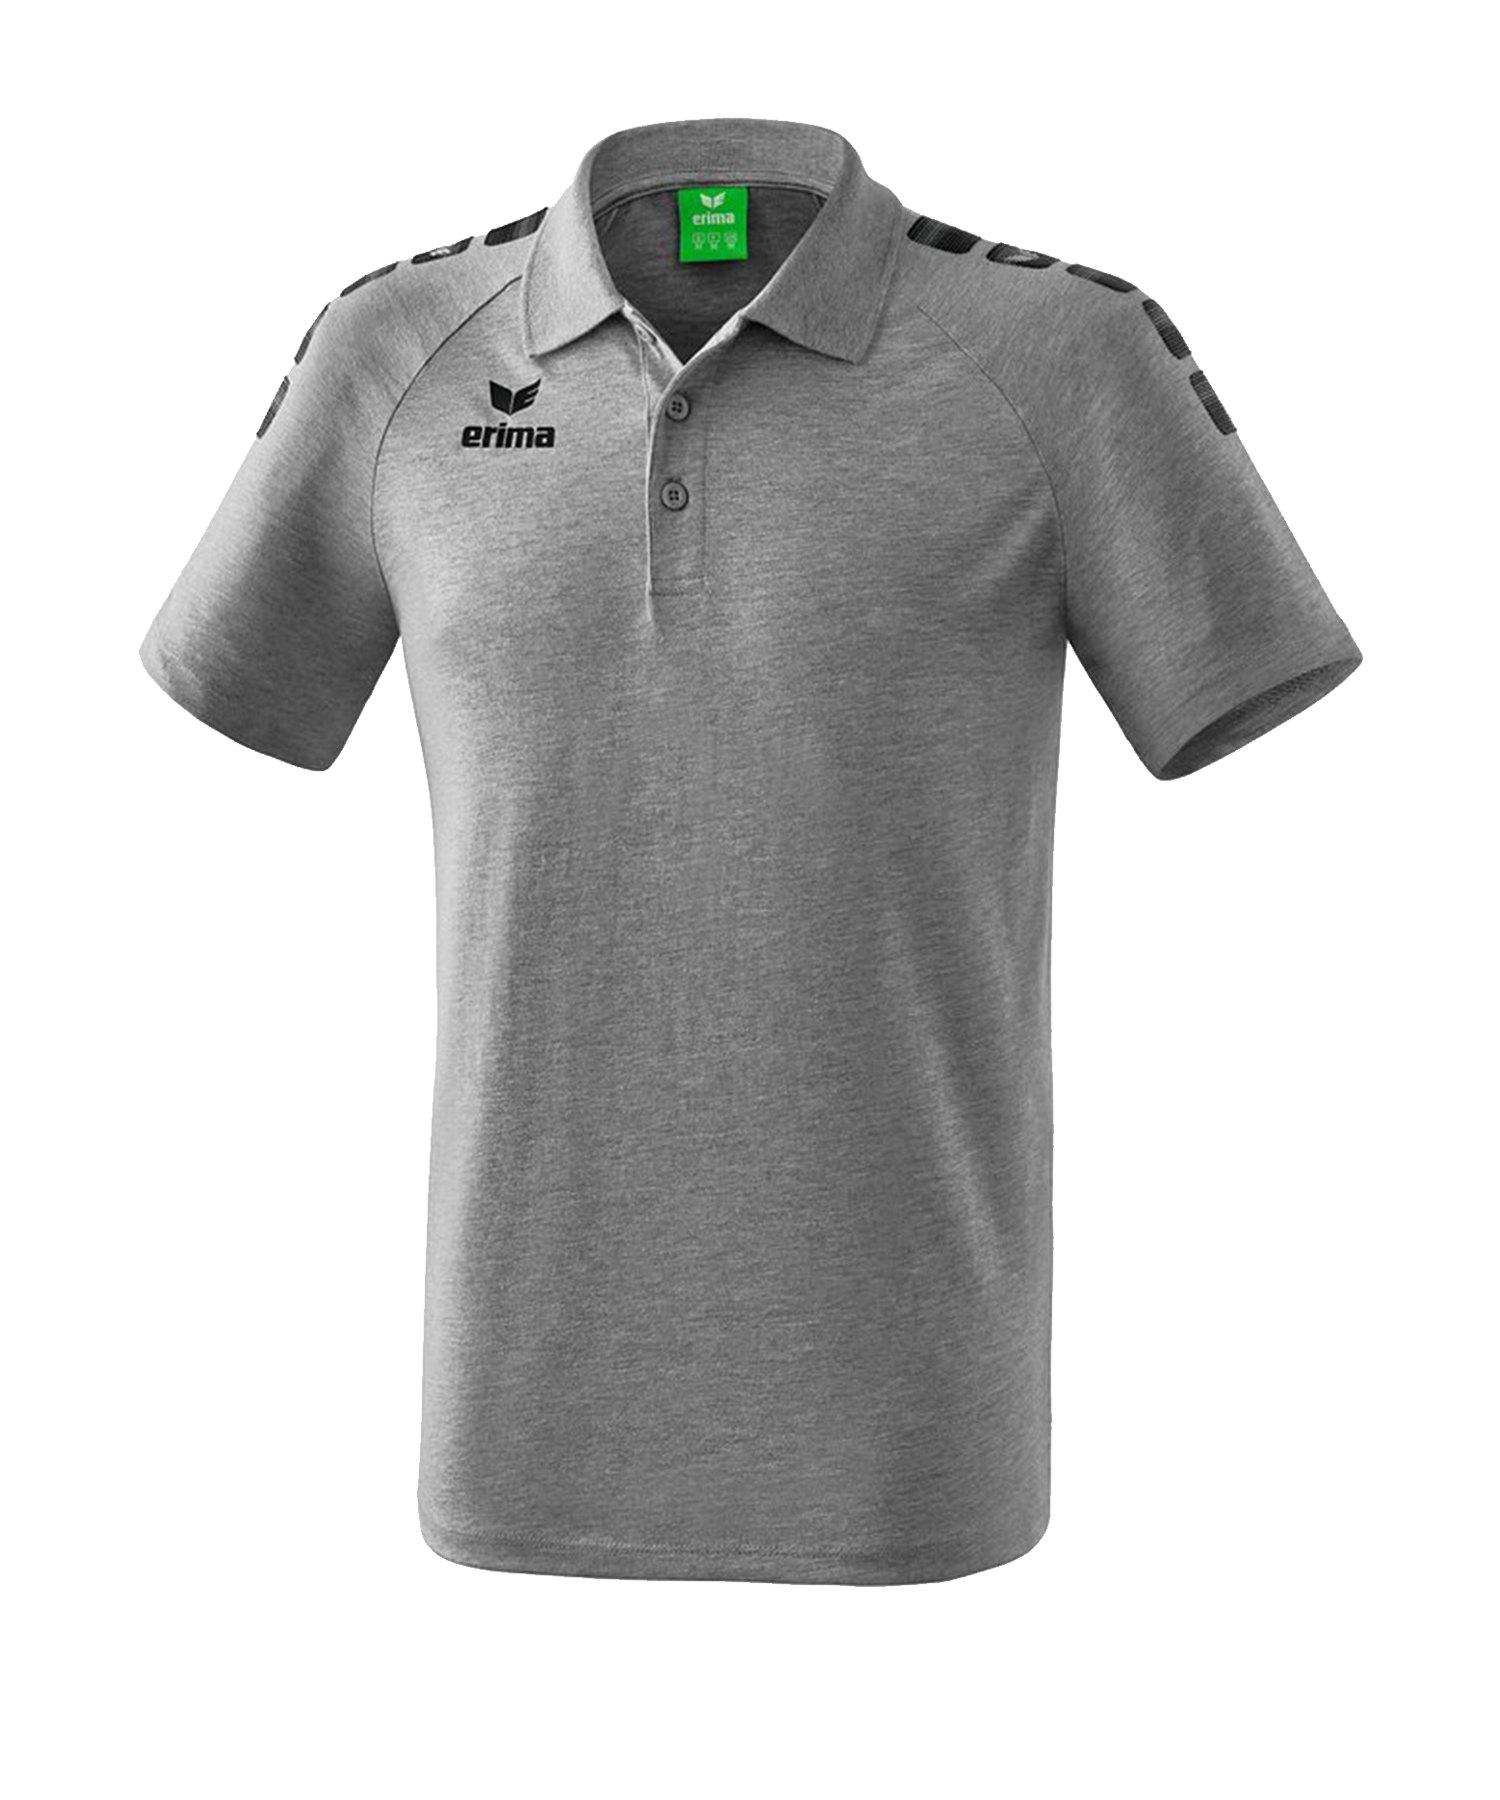 Erima Essential 5-C Poloshirt Grau Schwarz - Grau